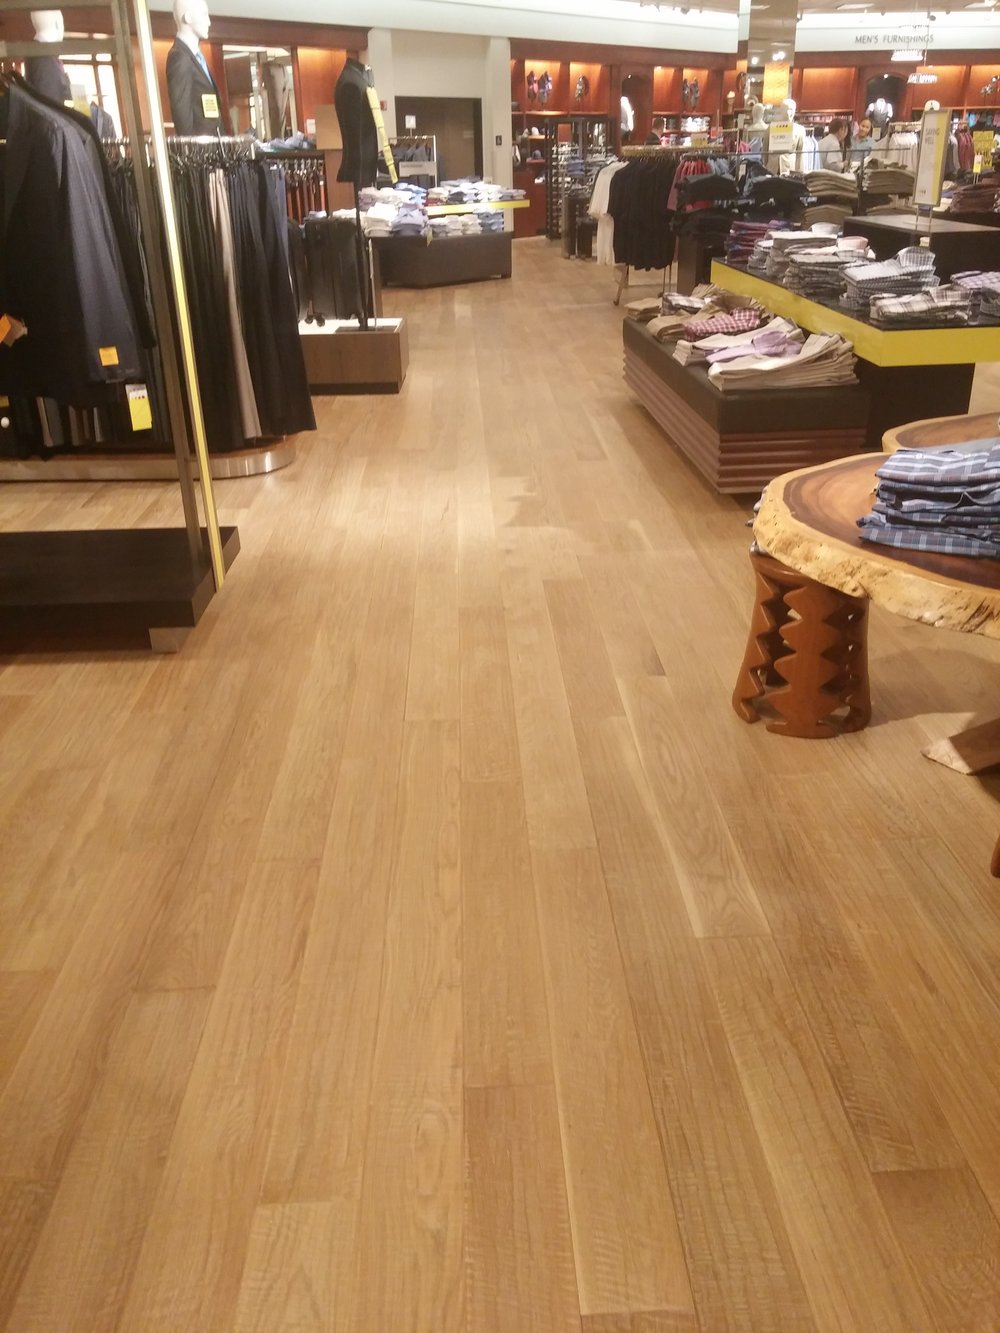 Major Retail-0012.jpg